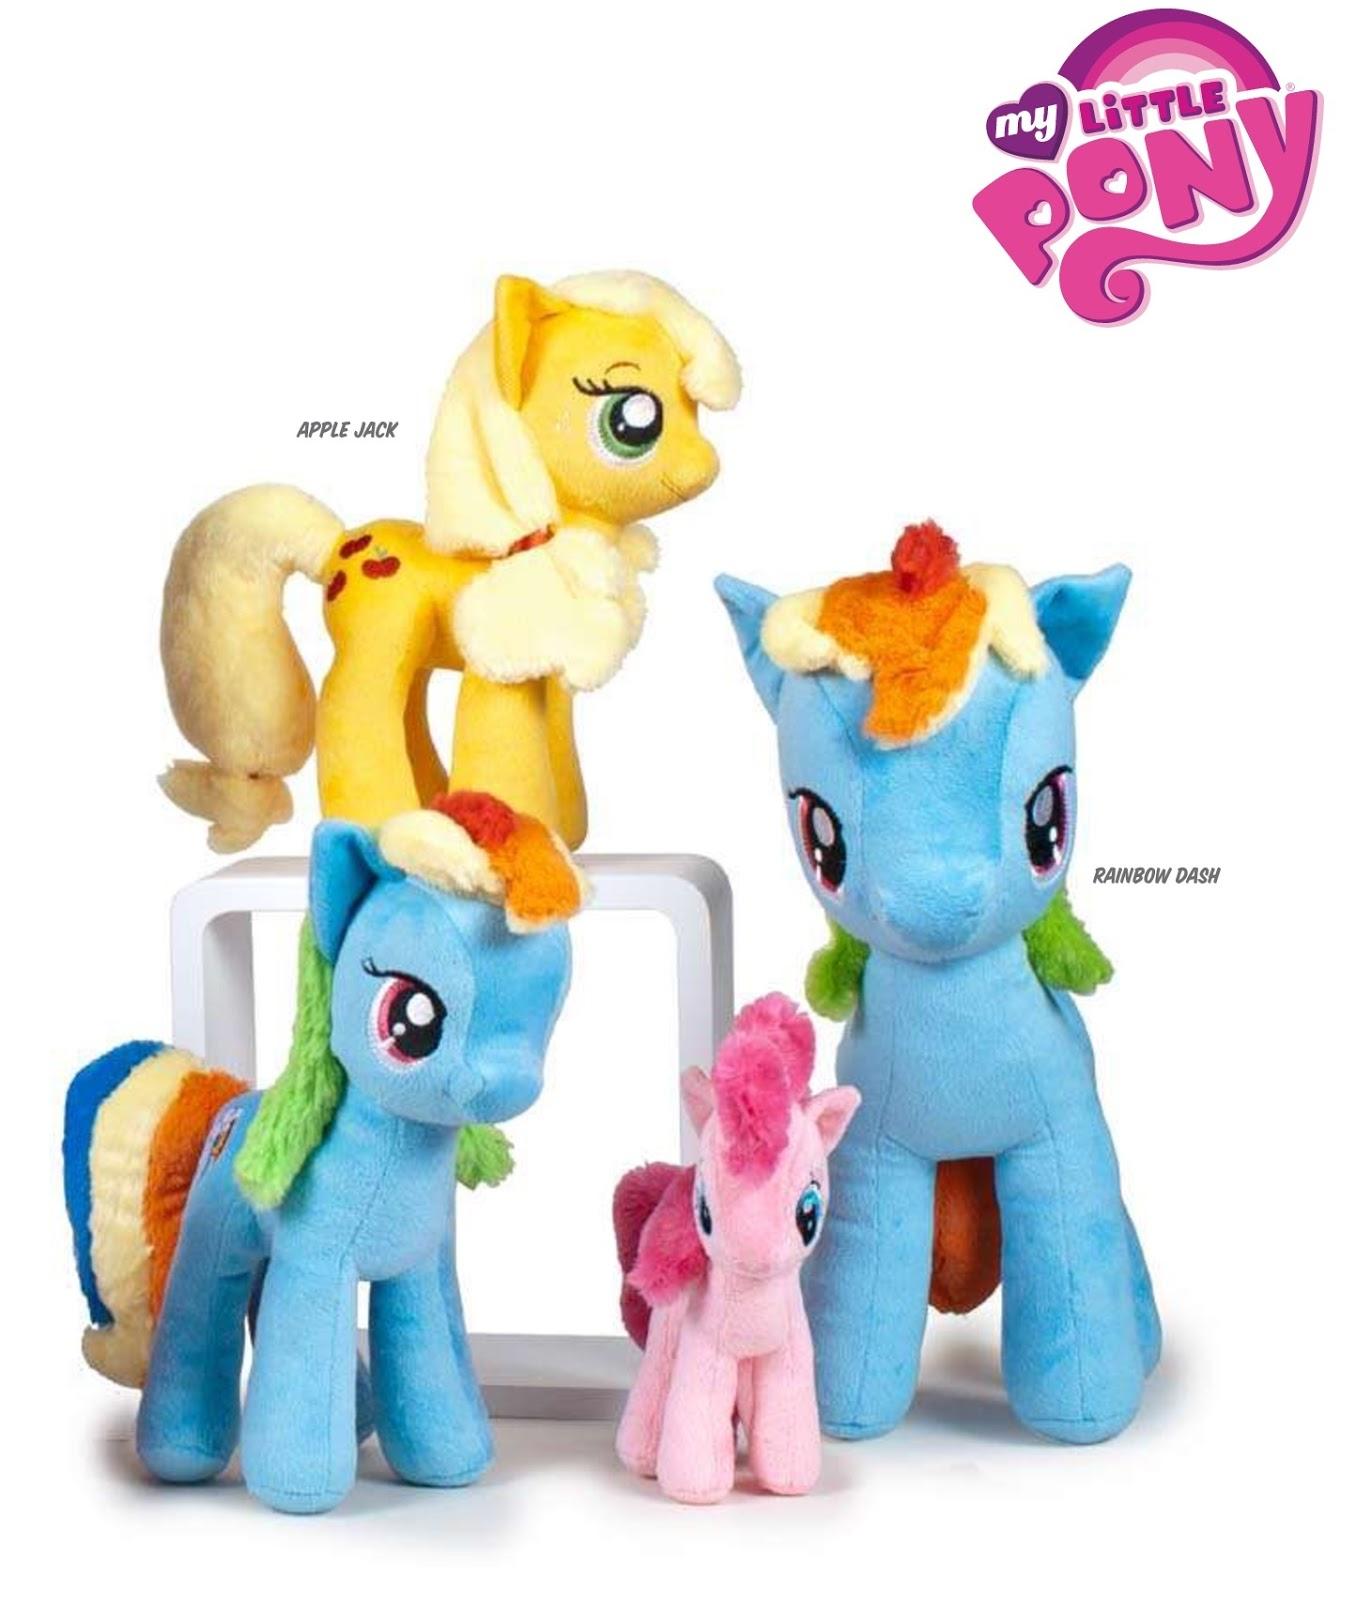 Play by Play Applejack Rainbow Dash Pinkie Pie Plushies